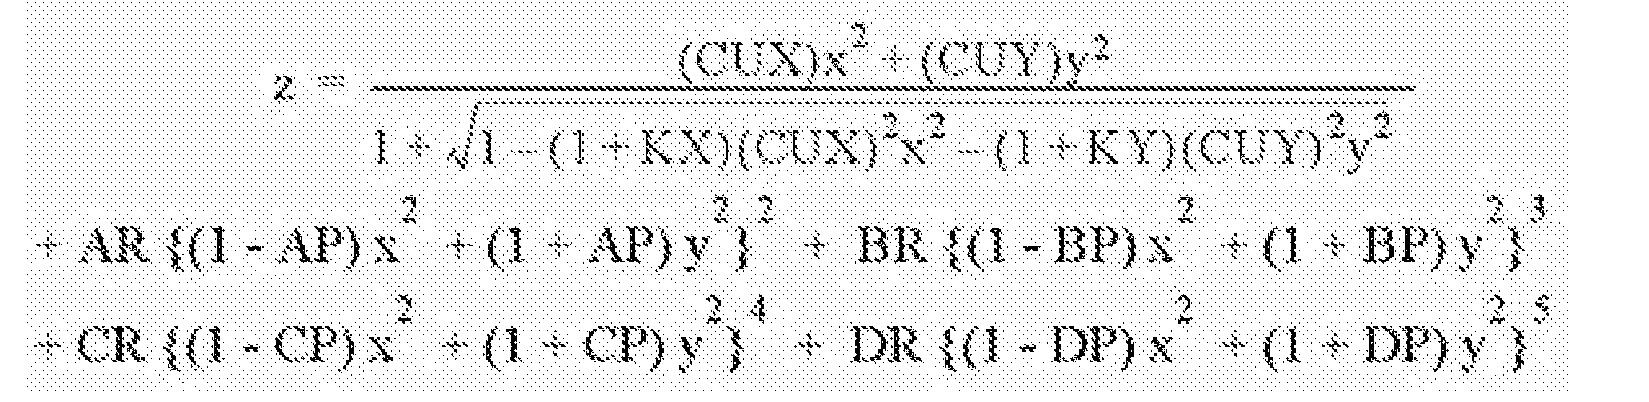 Figure CN205880874UD00071